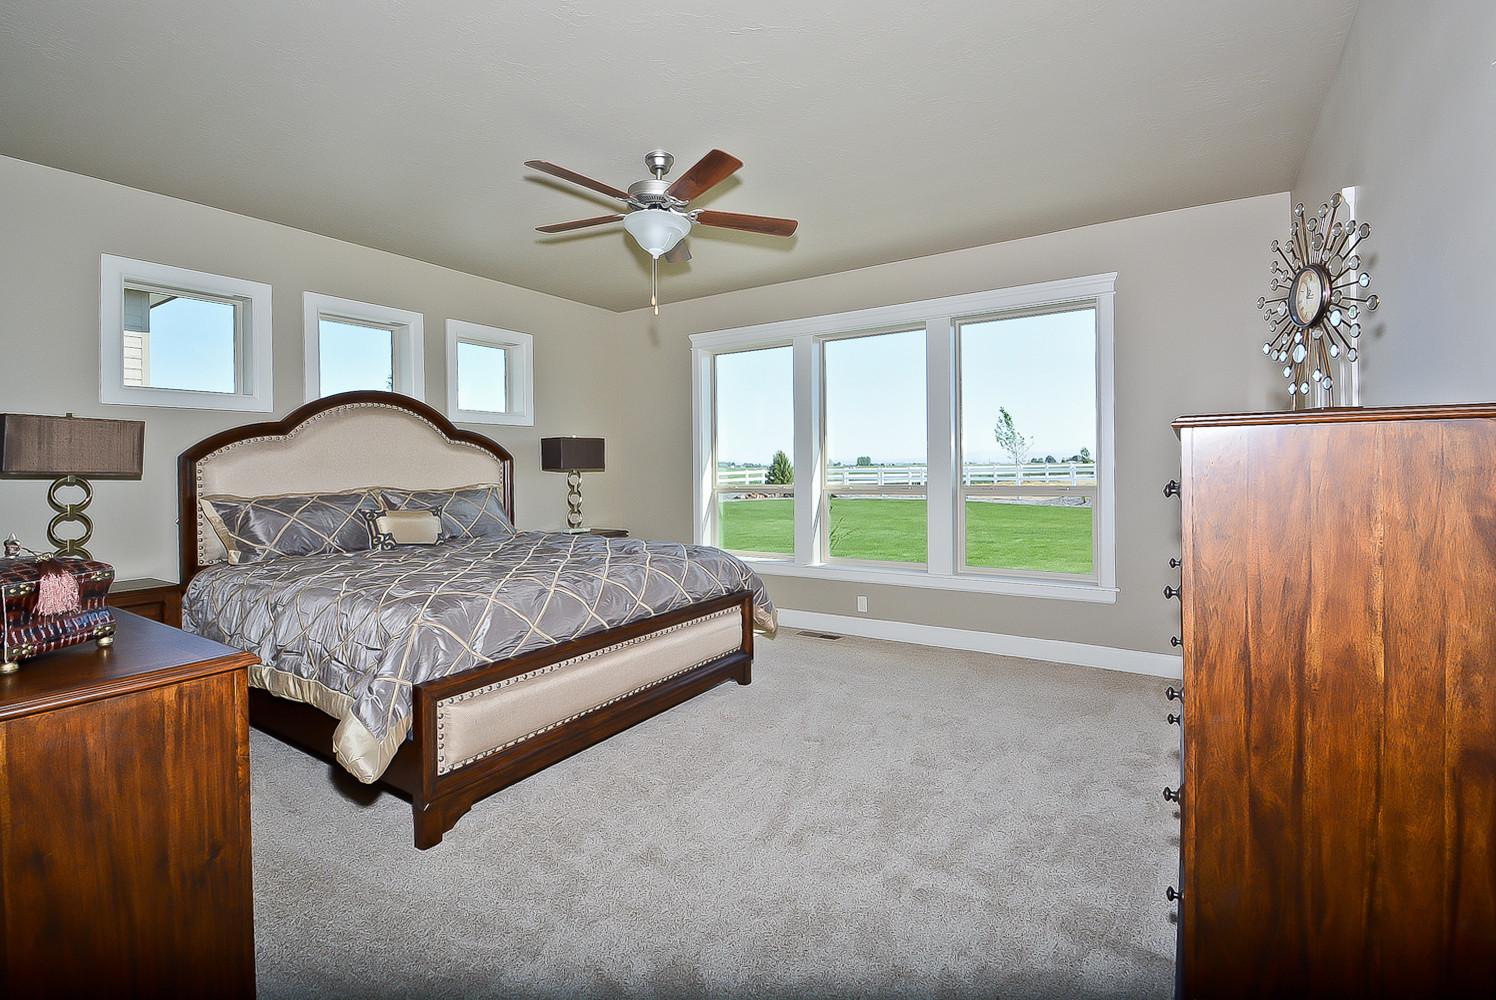 Contemporary Bedroom Interior Home Design